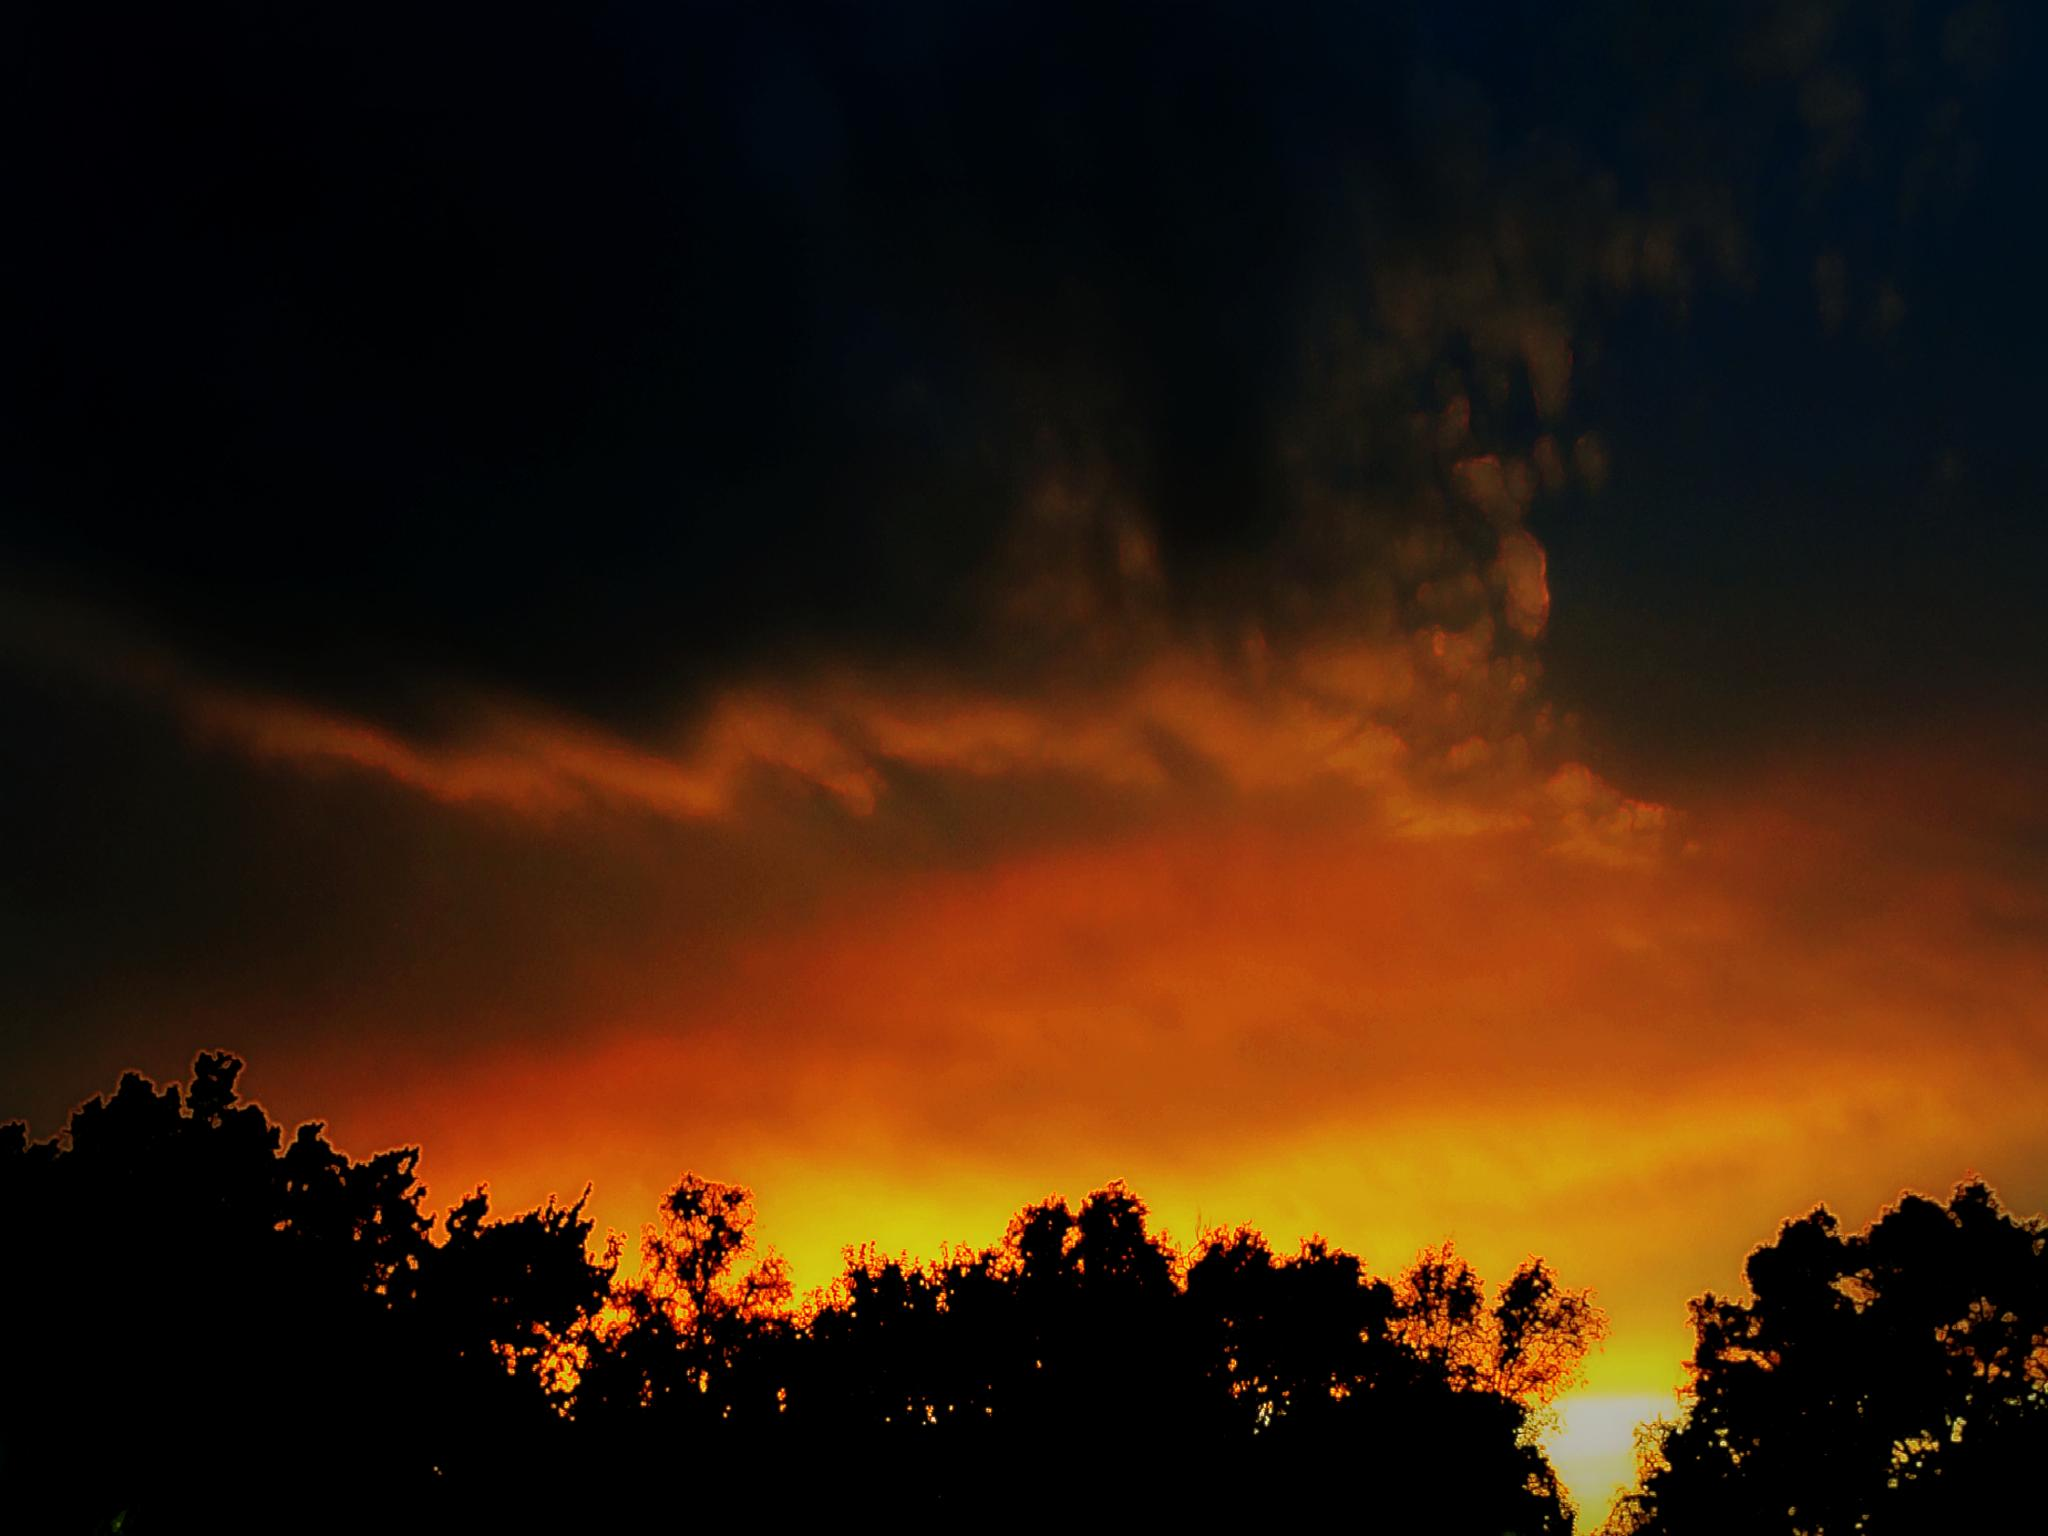 Hot Summer Nights by Lione'sLens